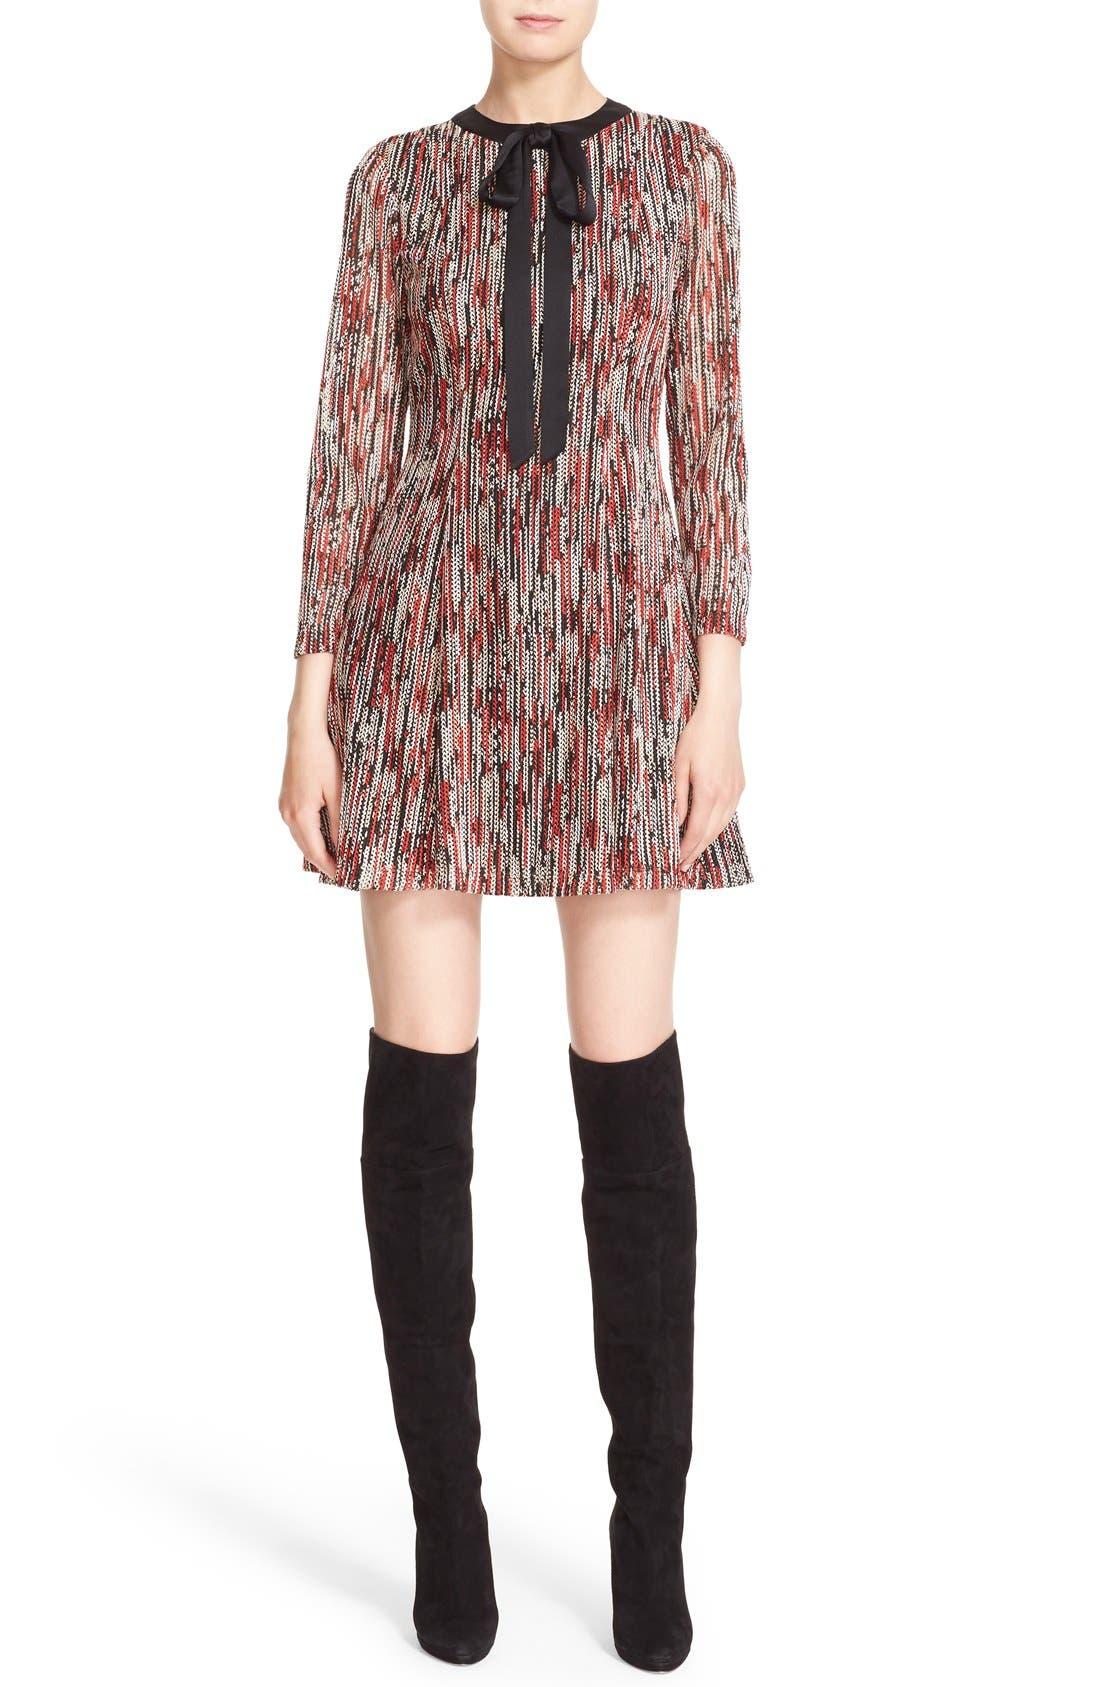 Main Image - Alice + Olivia 'Gwyneth' Print Tie Neck Fit & Flare Dress